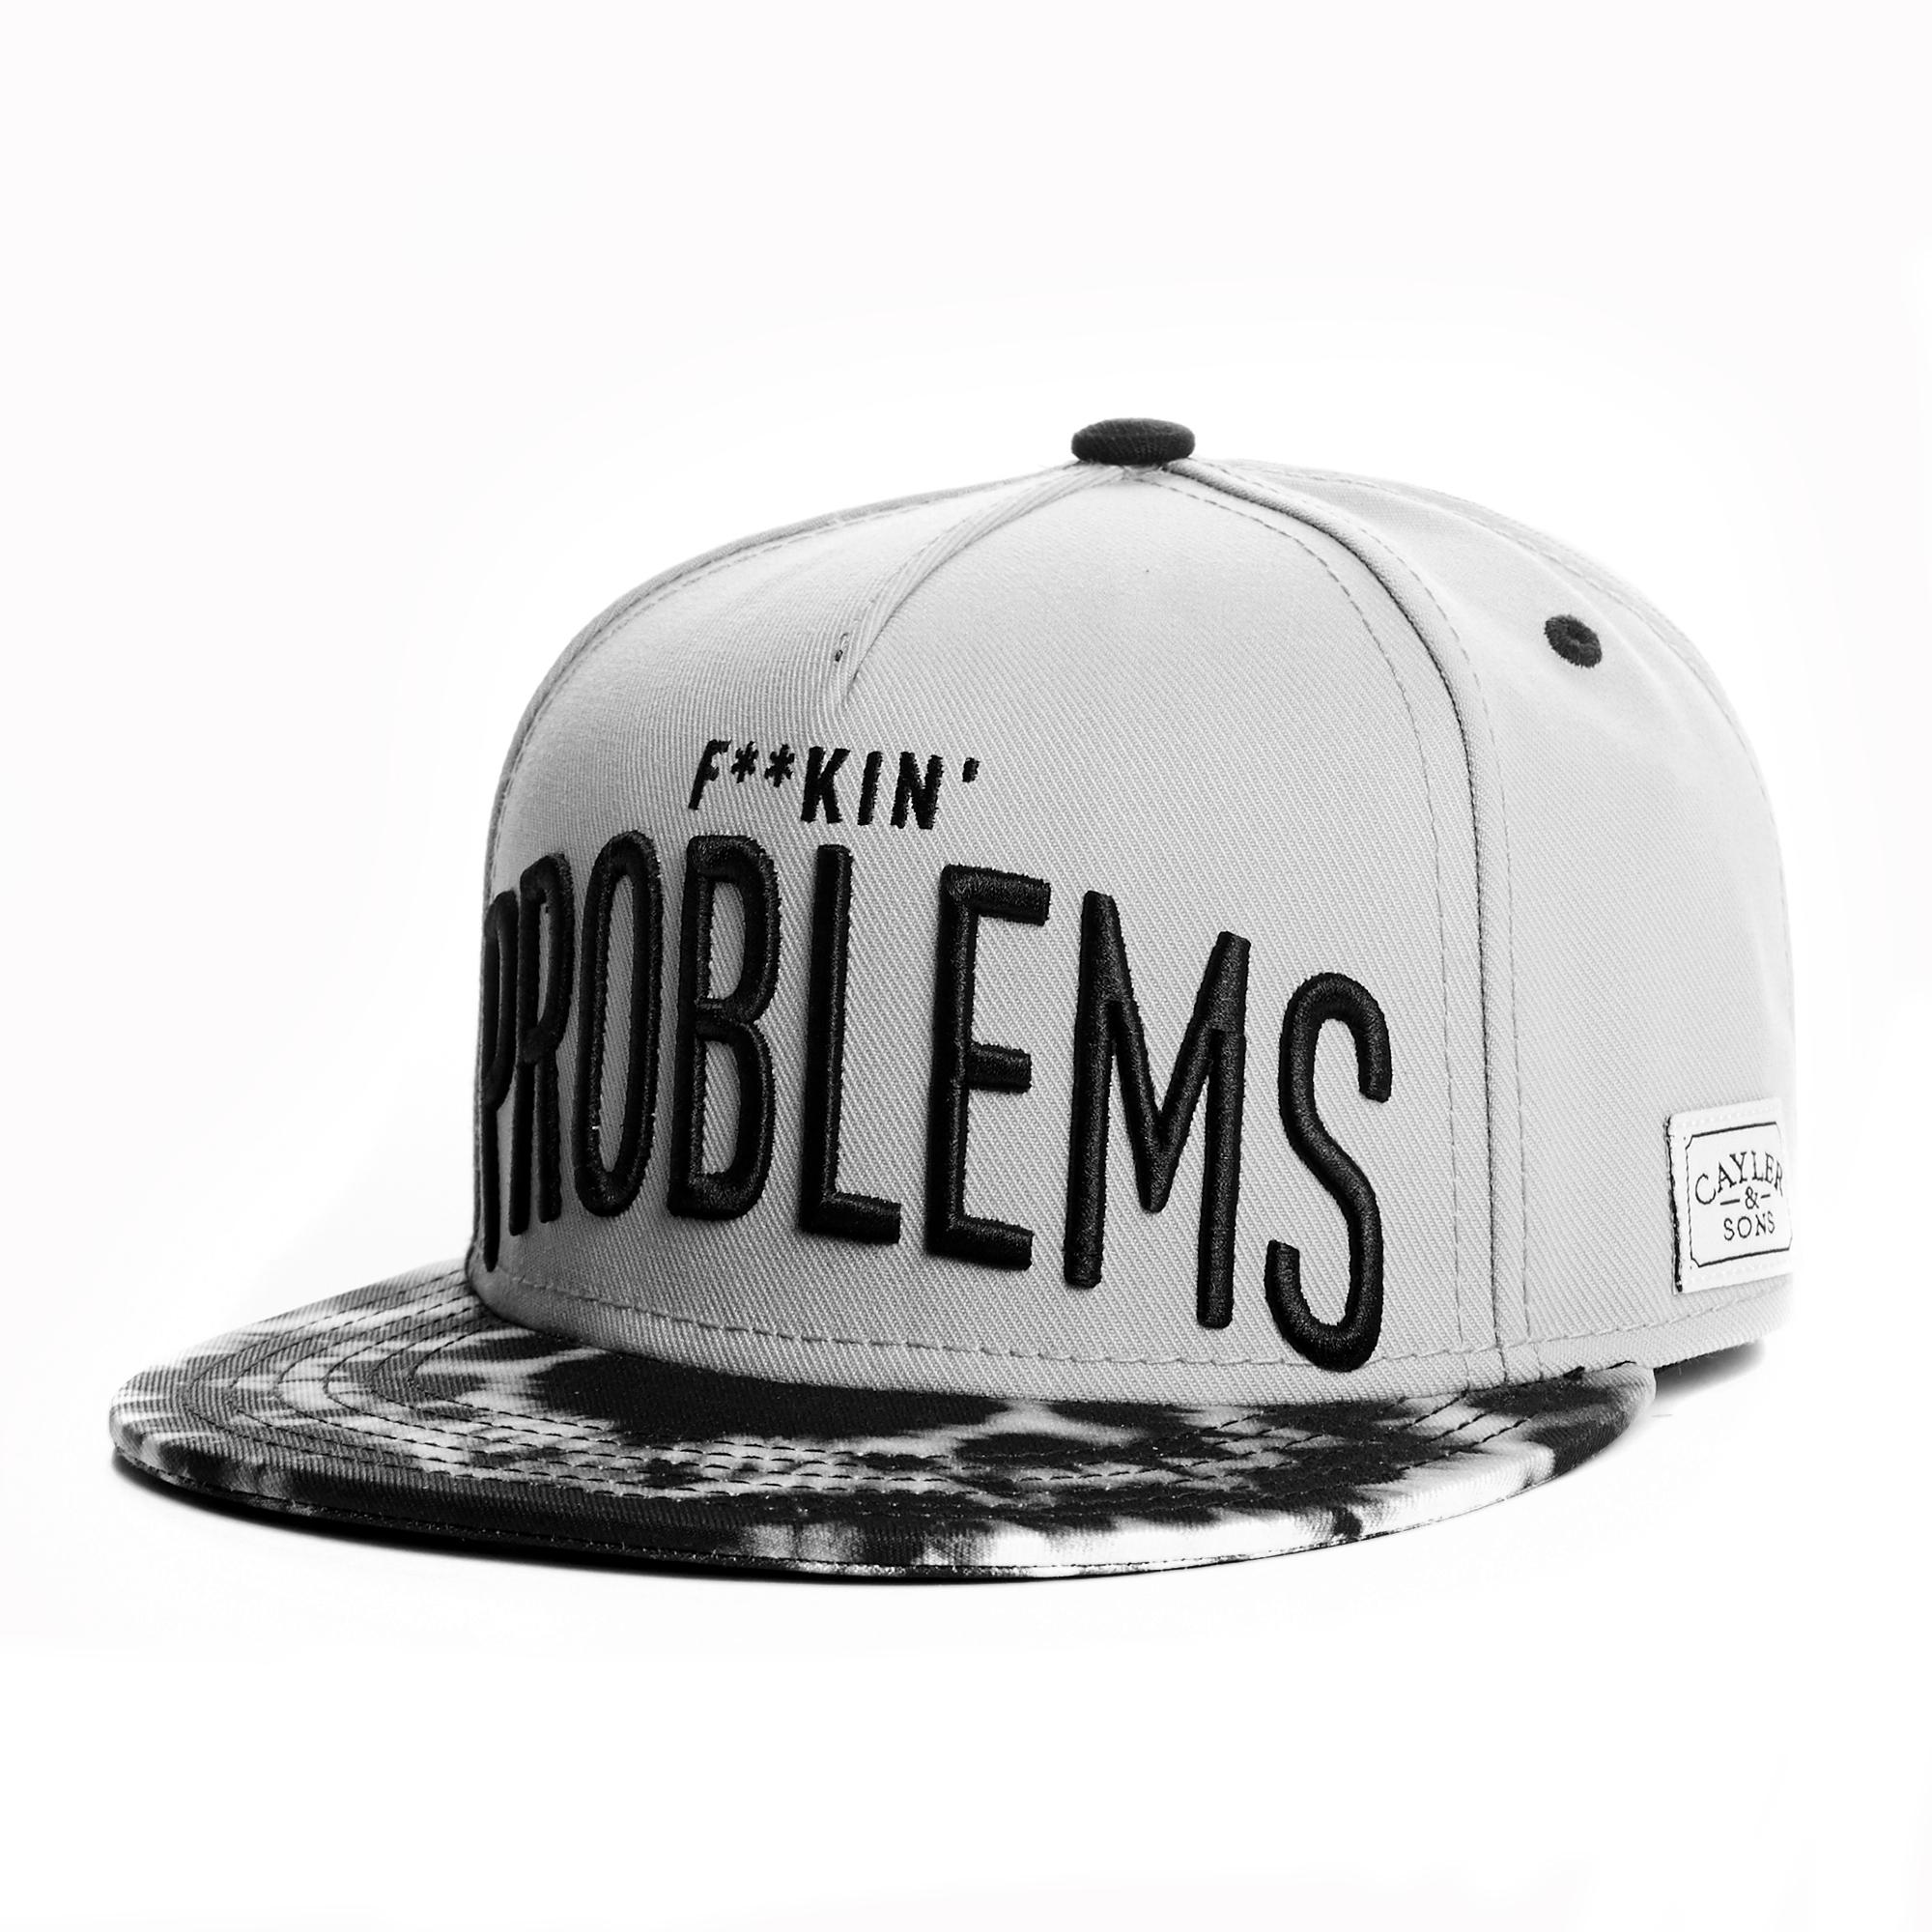 cns-f-king-problems-cap-grey-mc-01